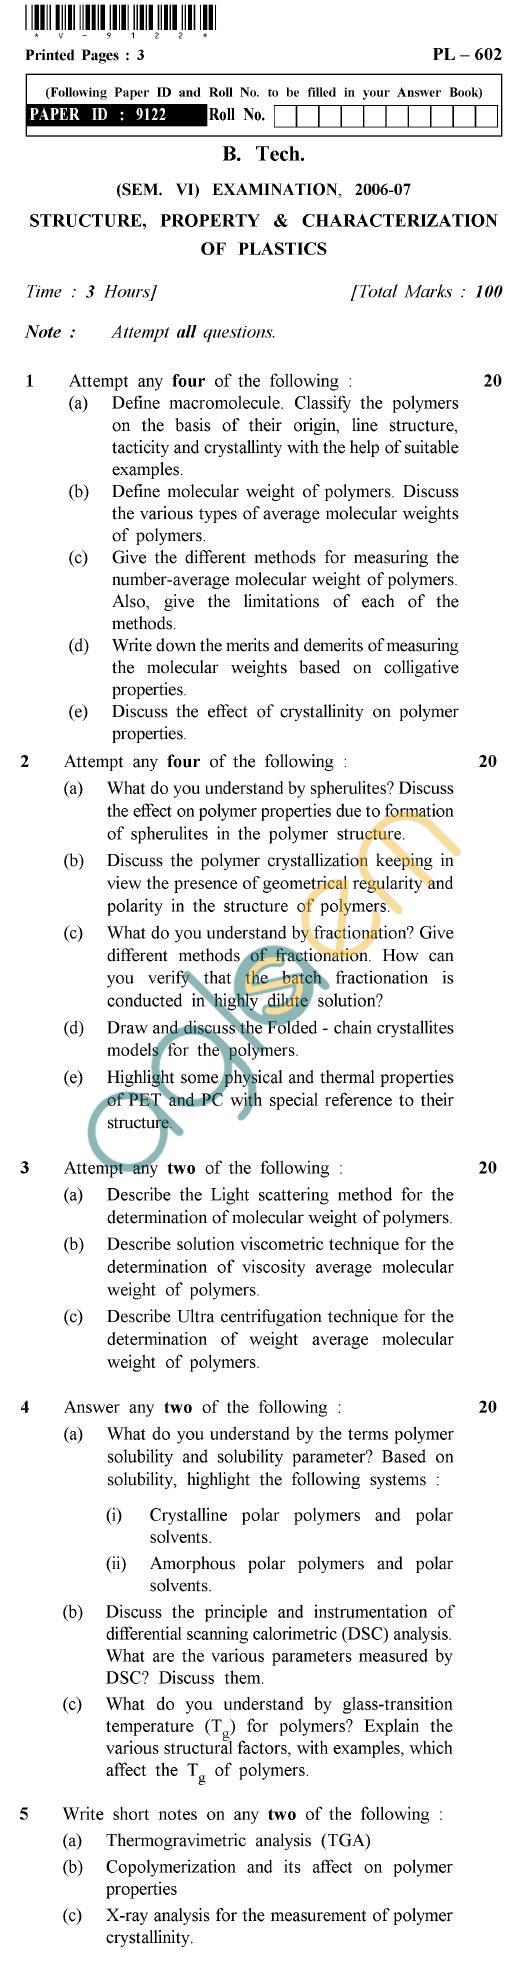 UPTU B.Tech Question Papers -PL-602 - Structure, Property & Characterization of Plastics